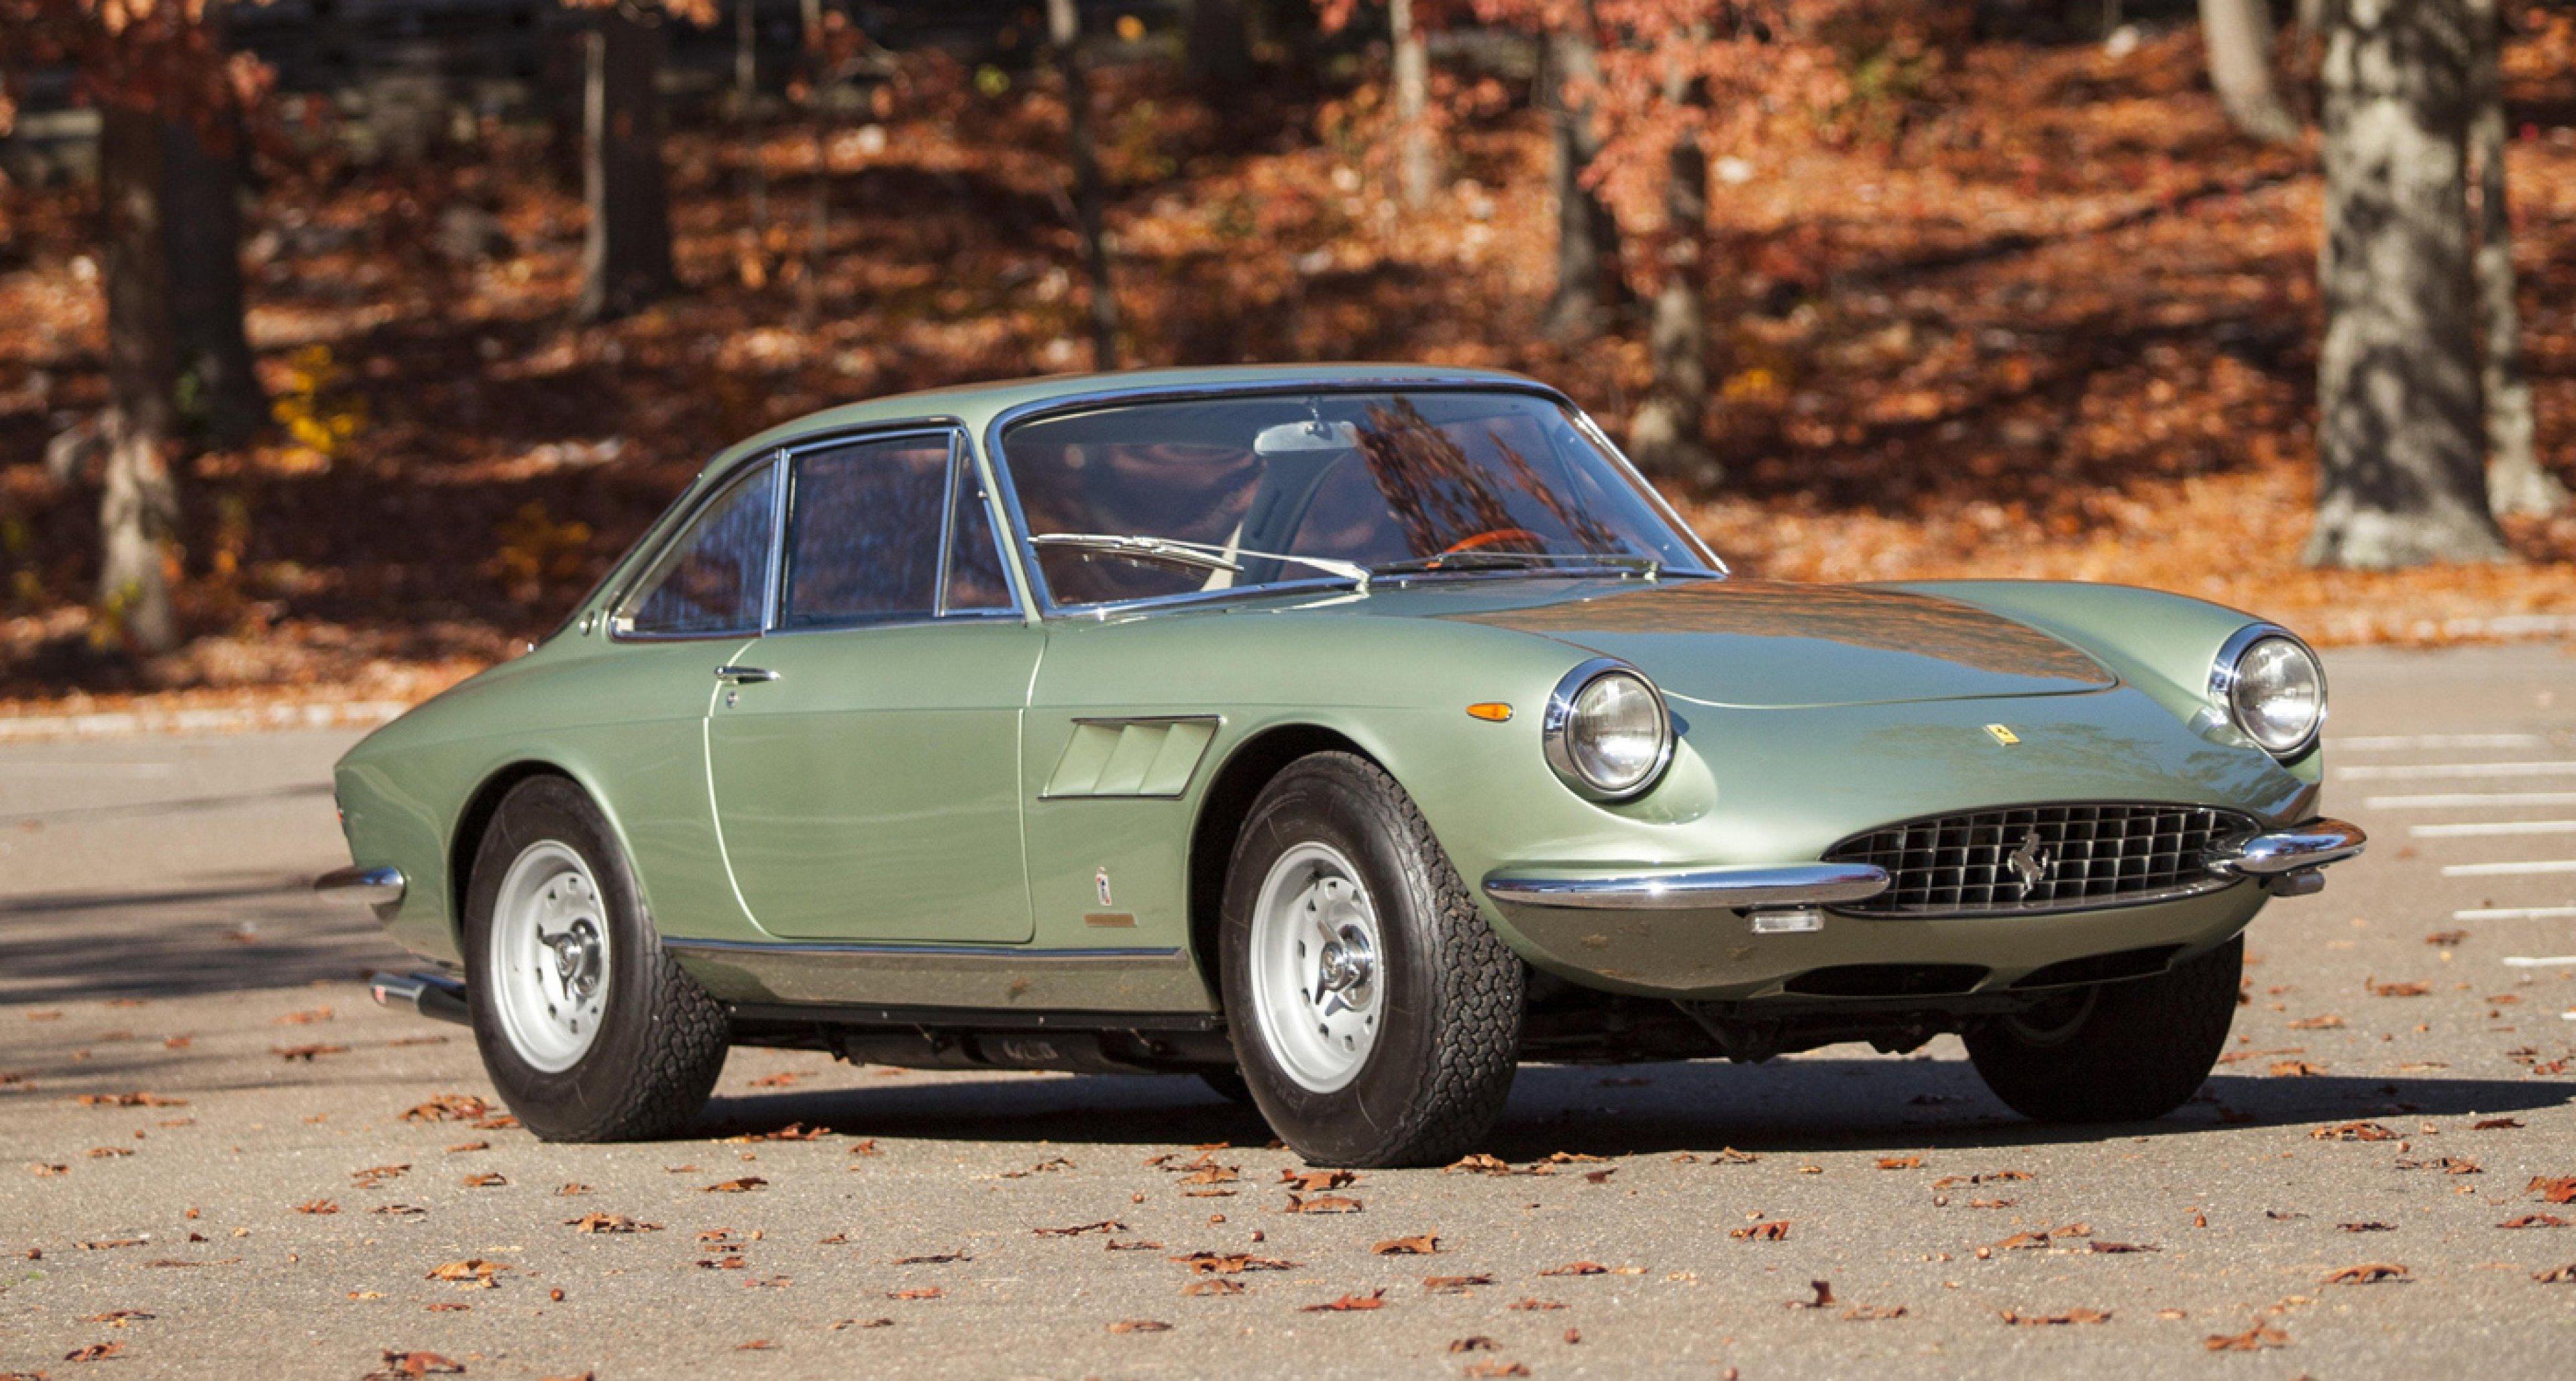 1967 Ferrari 300 GTC